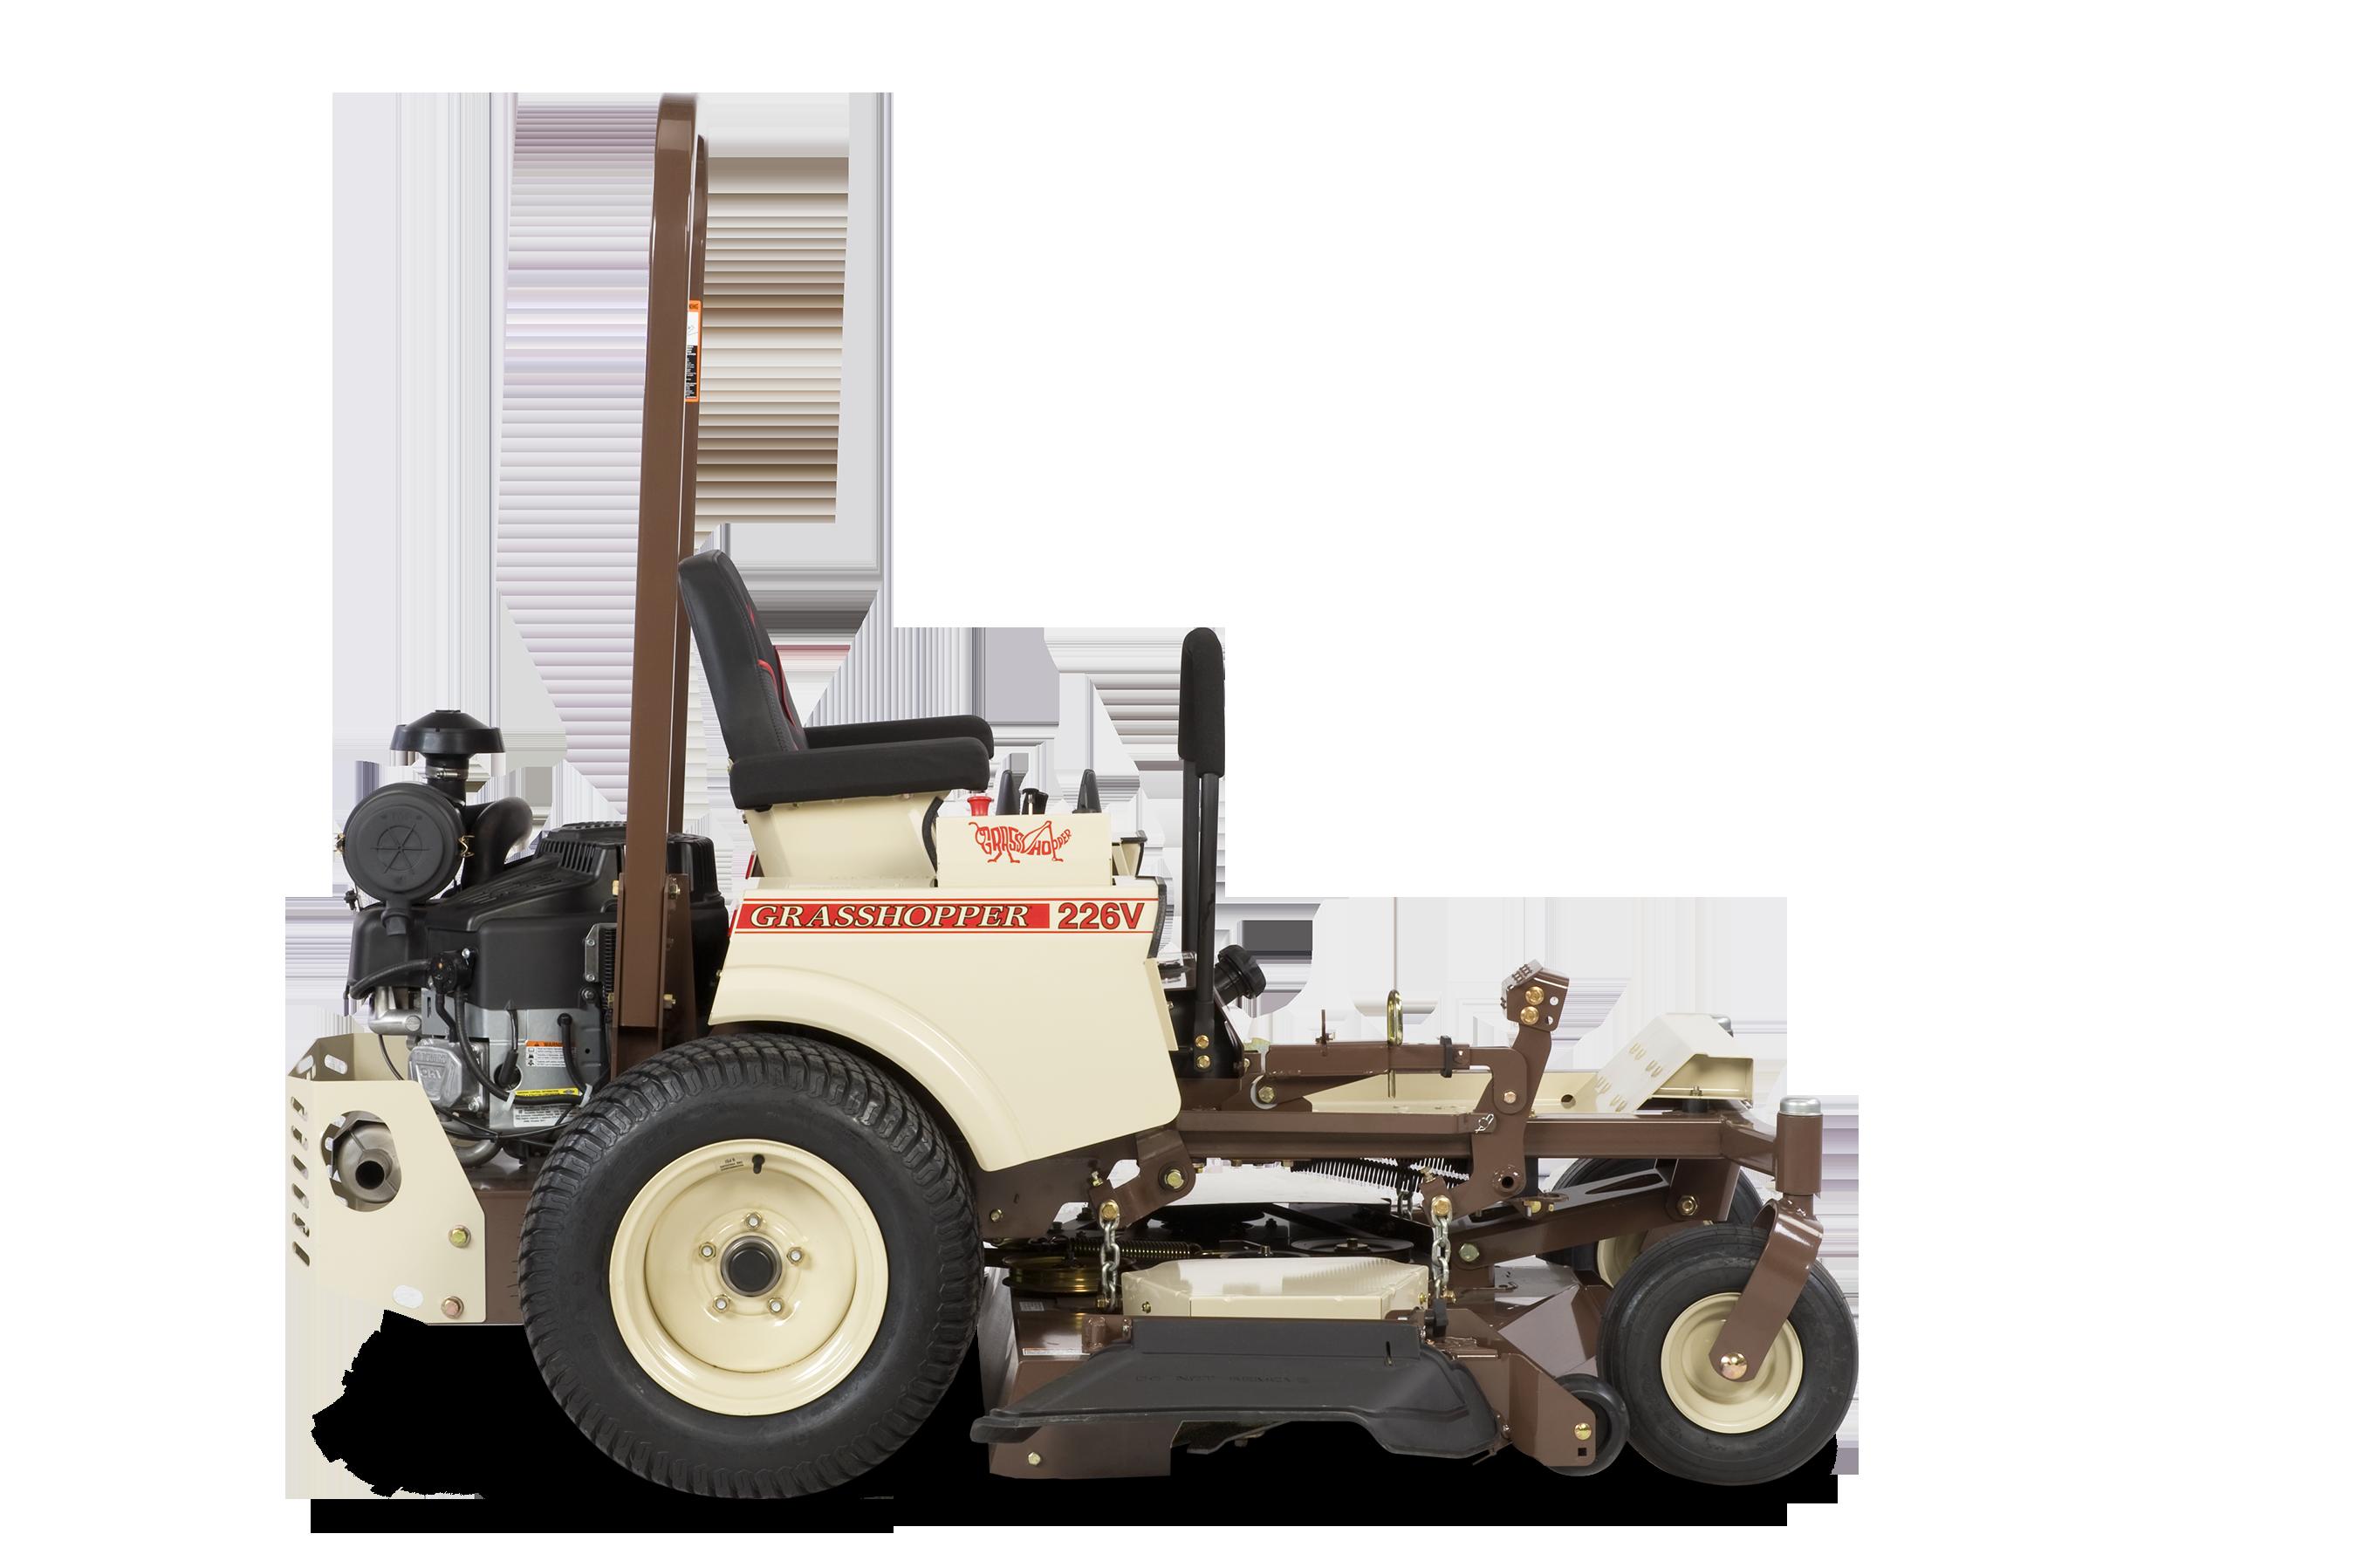 226V-G4 Dependable Zero-Turn Lawn Mower for Sale in Parsons, KS